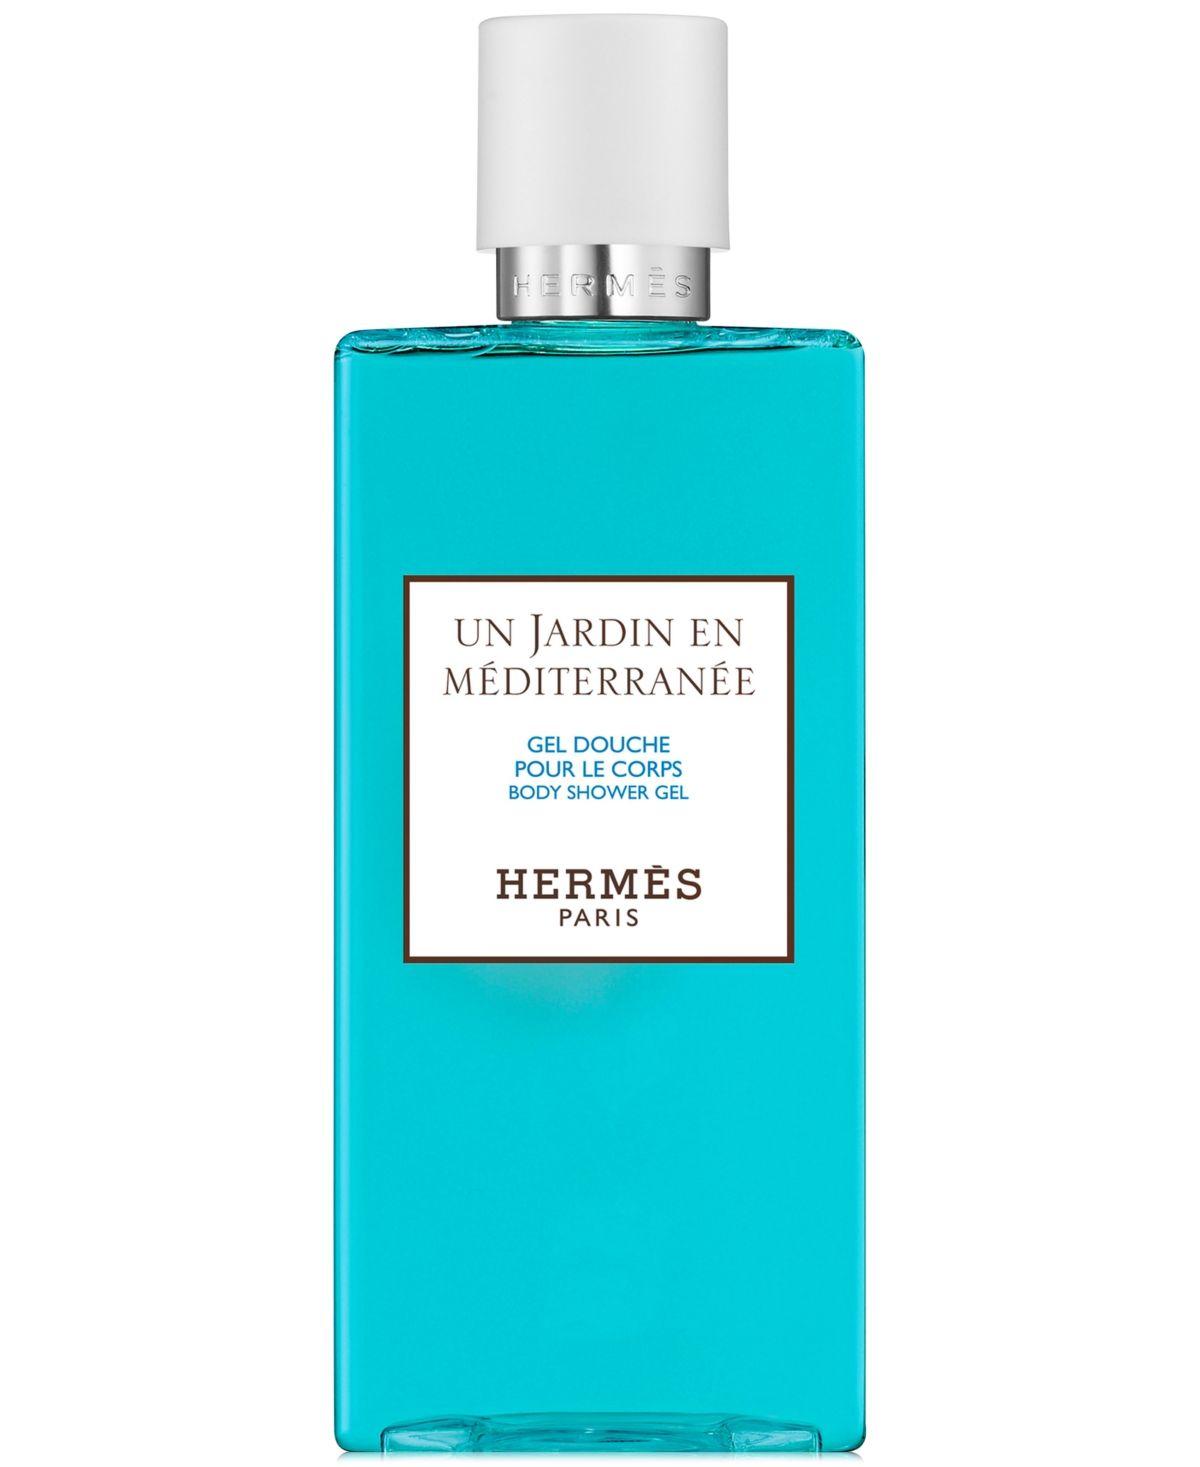 Hermes Un Jardin En Mediterranee Body Shower Gel, 6.7-Oz ... destiné Un Jardin En Méditerranée